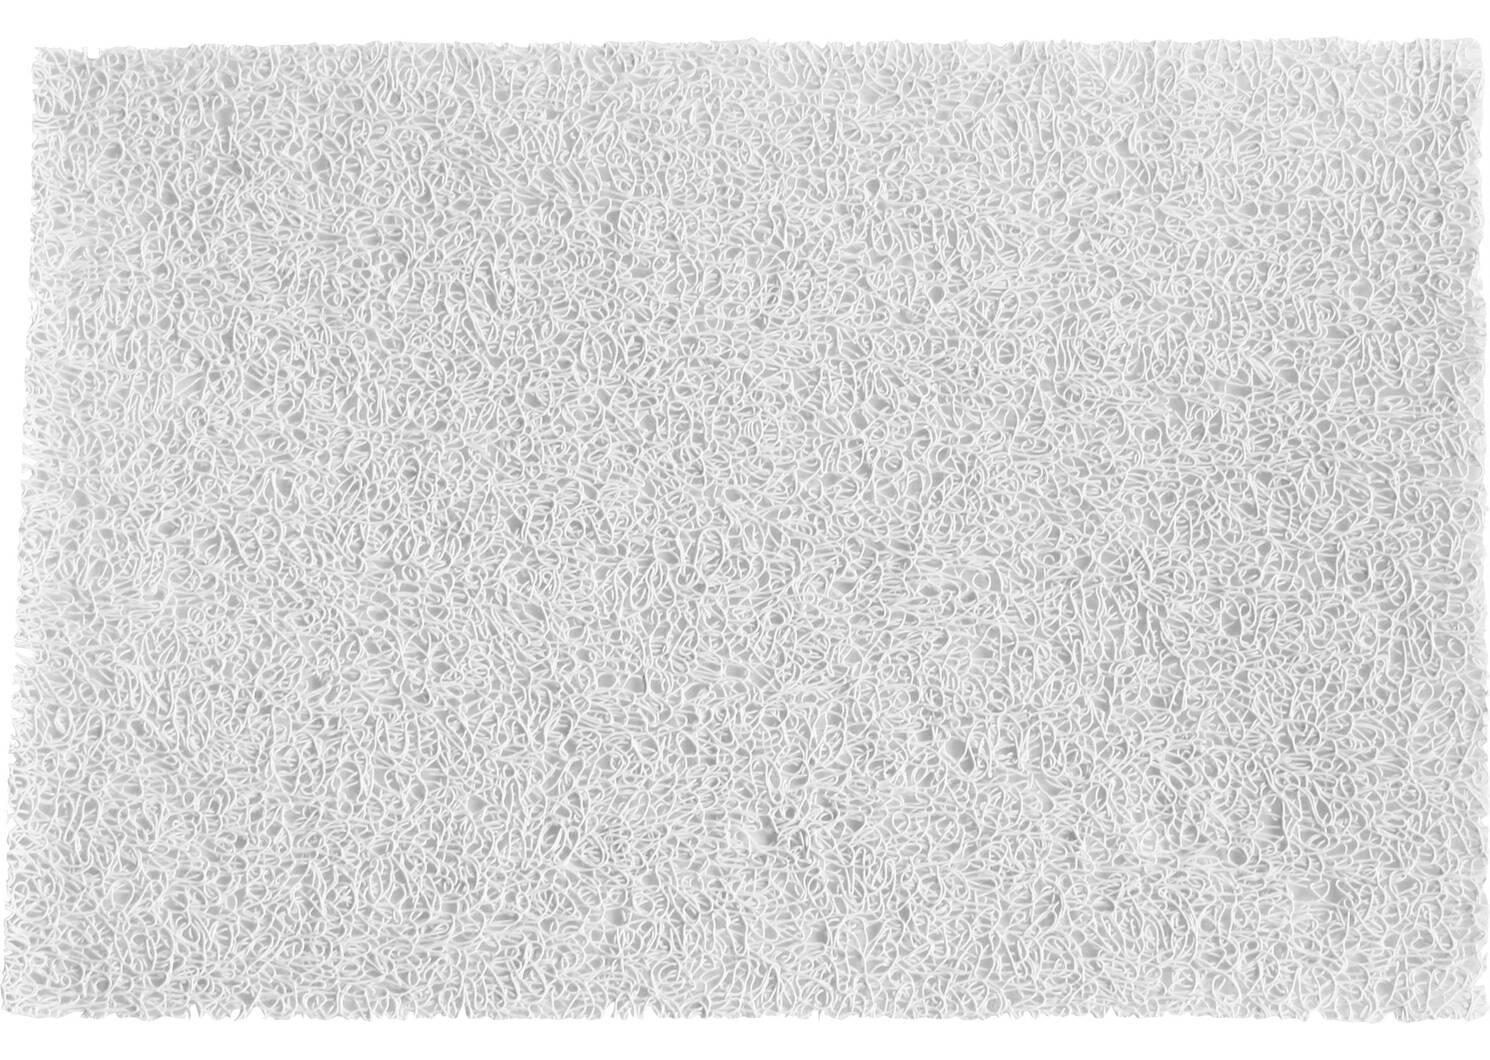 Dizzy Placemat White